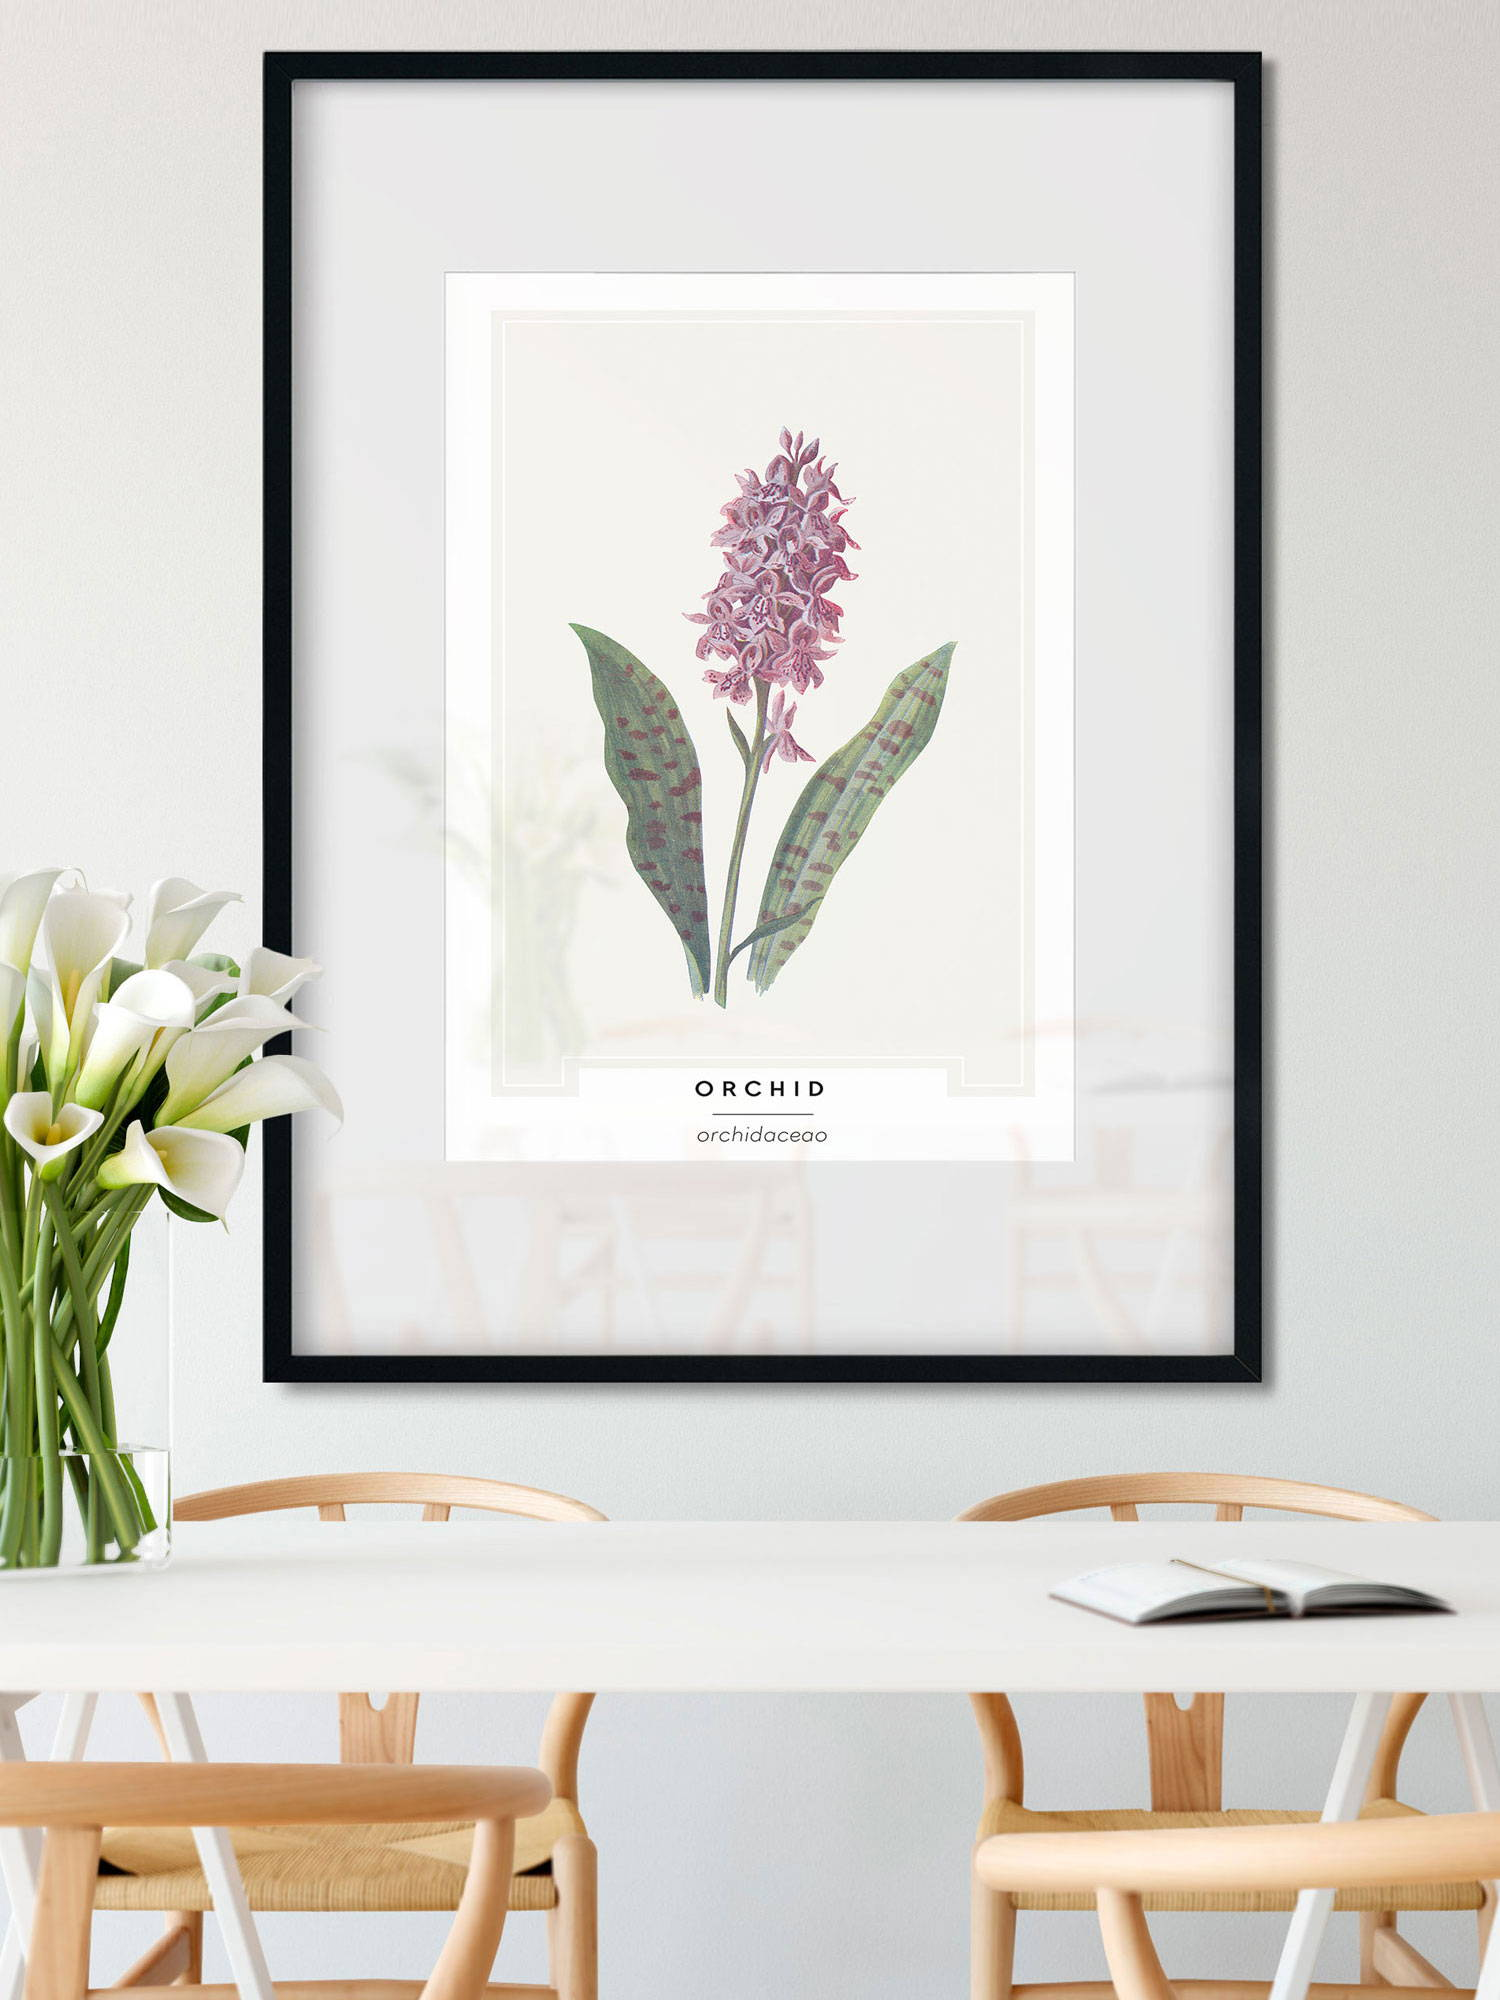 Orchid botanical wall art print